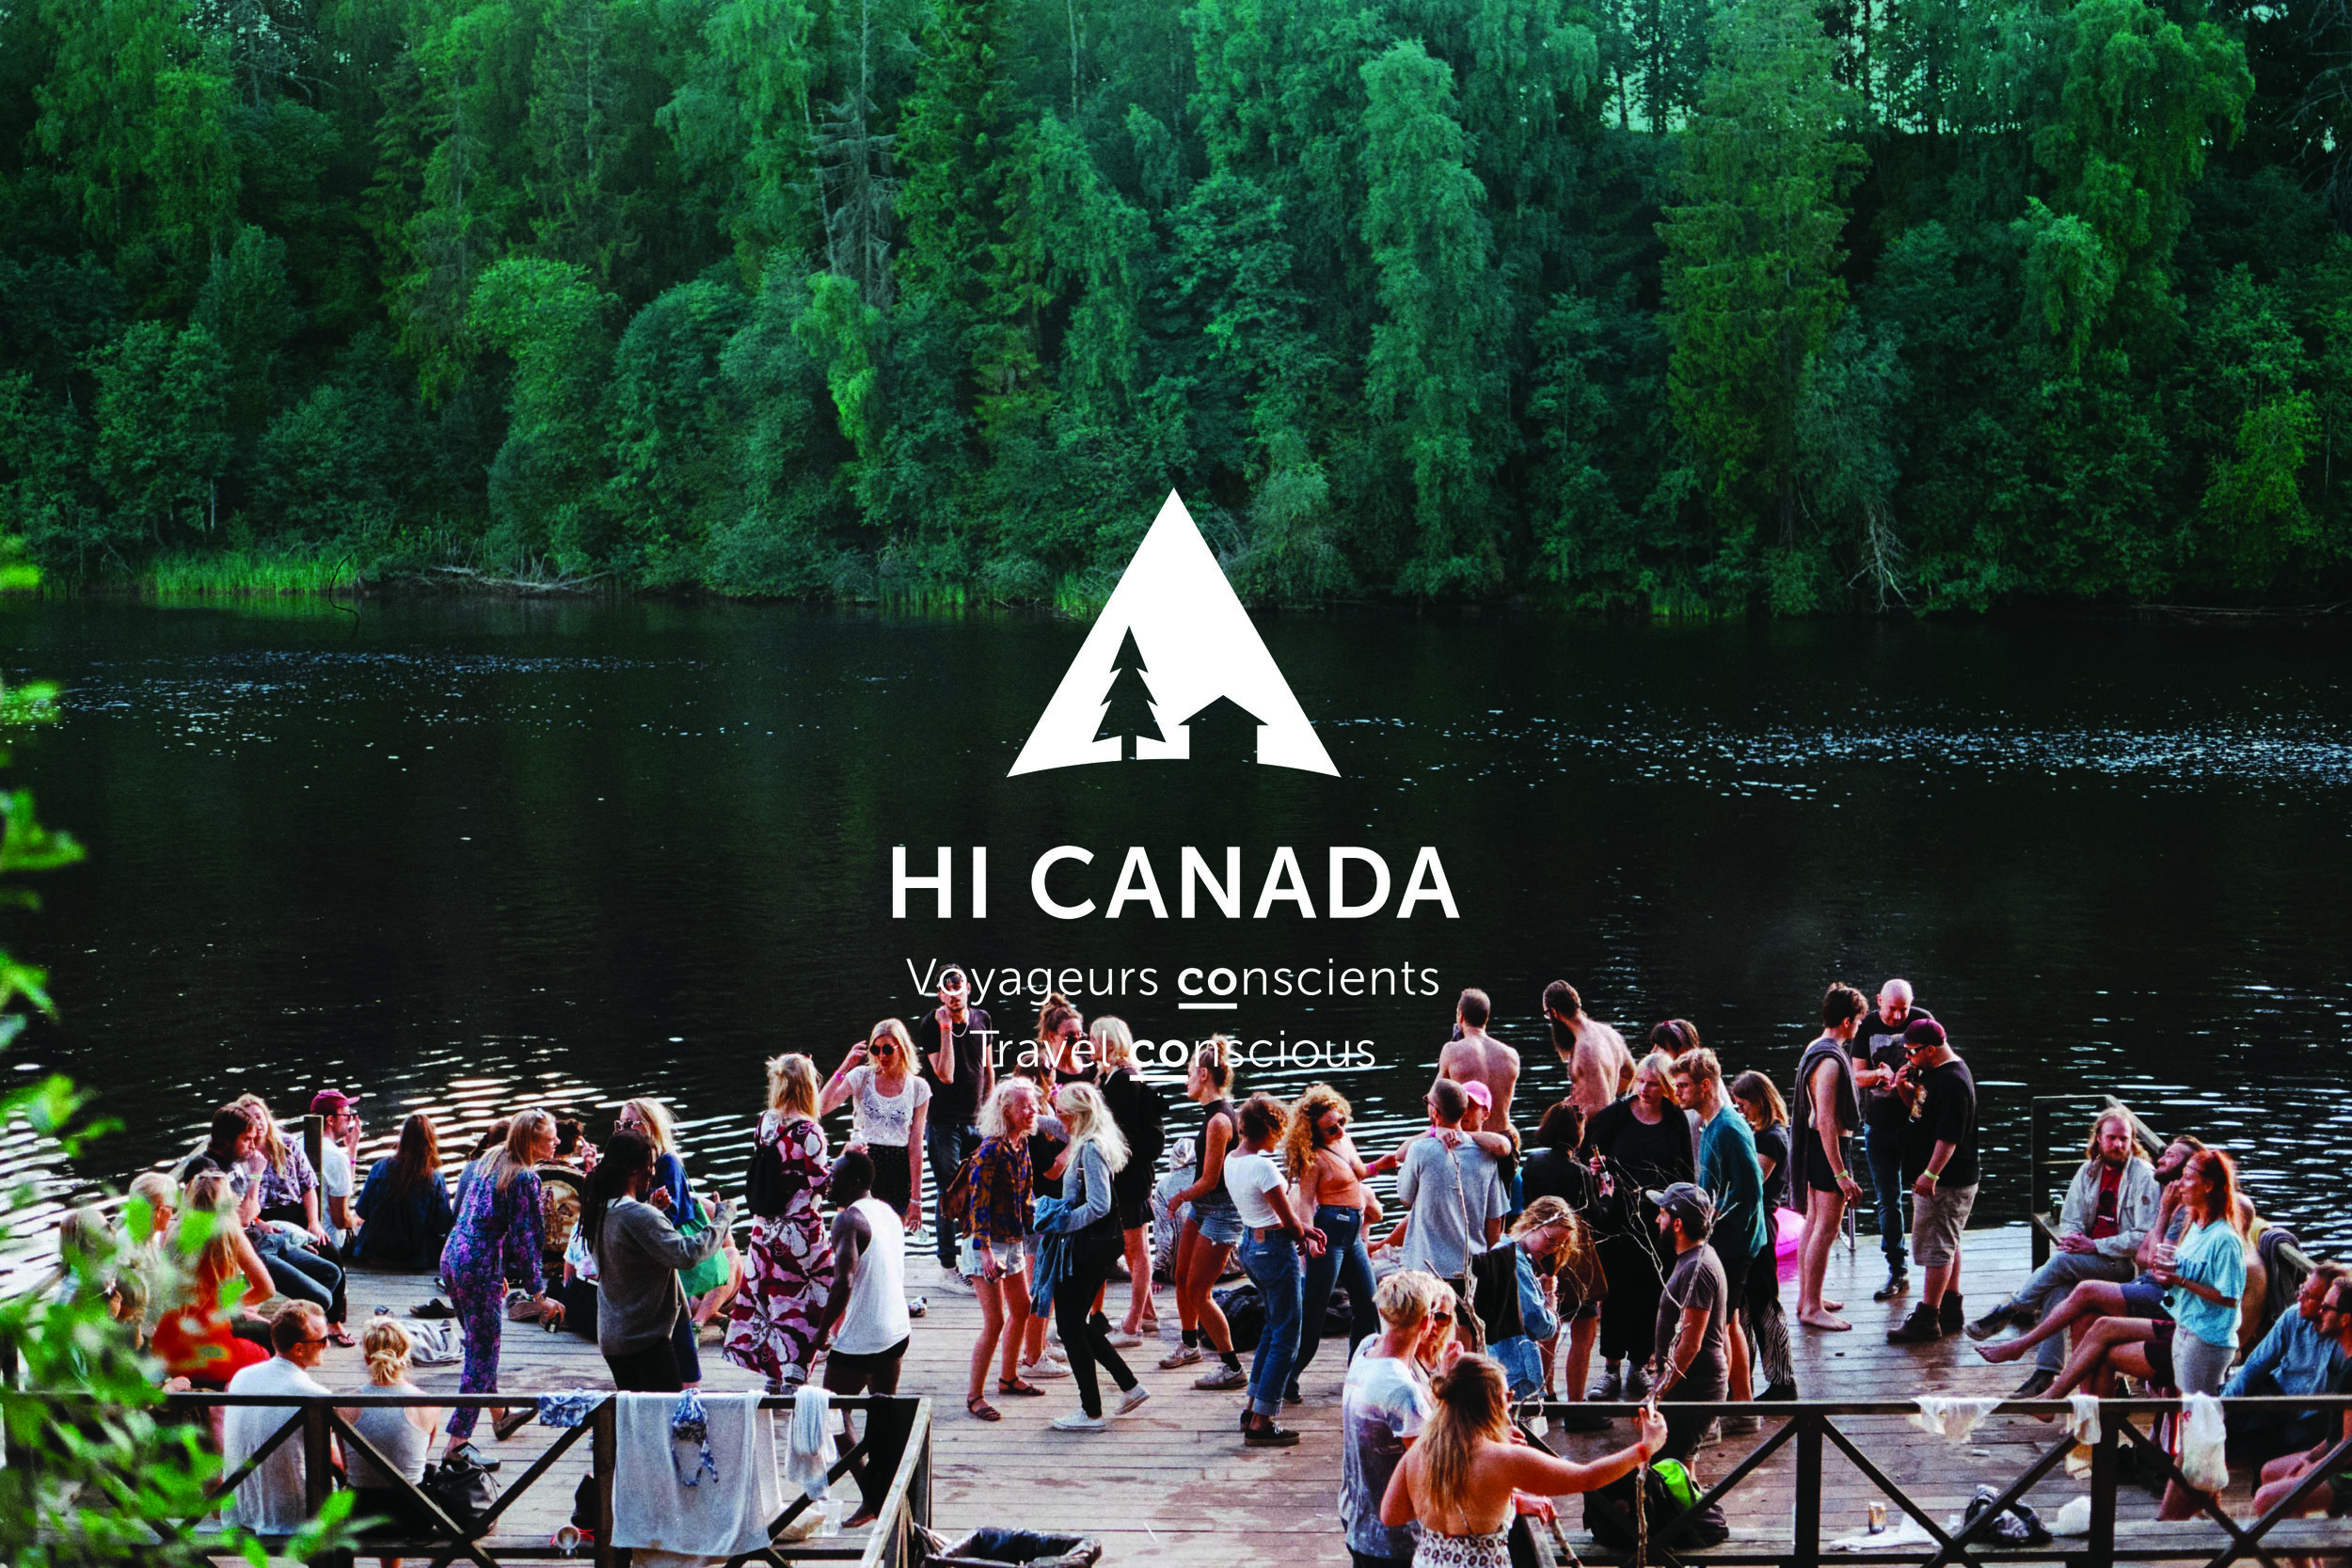 HI Canada_Sleep for Peace_Youth Travel Foundation